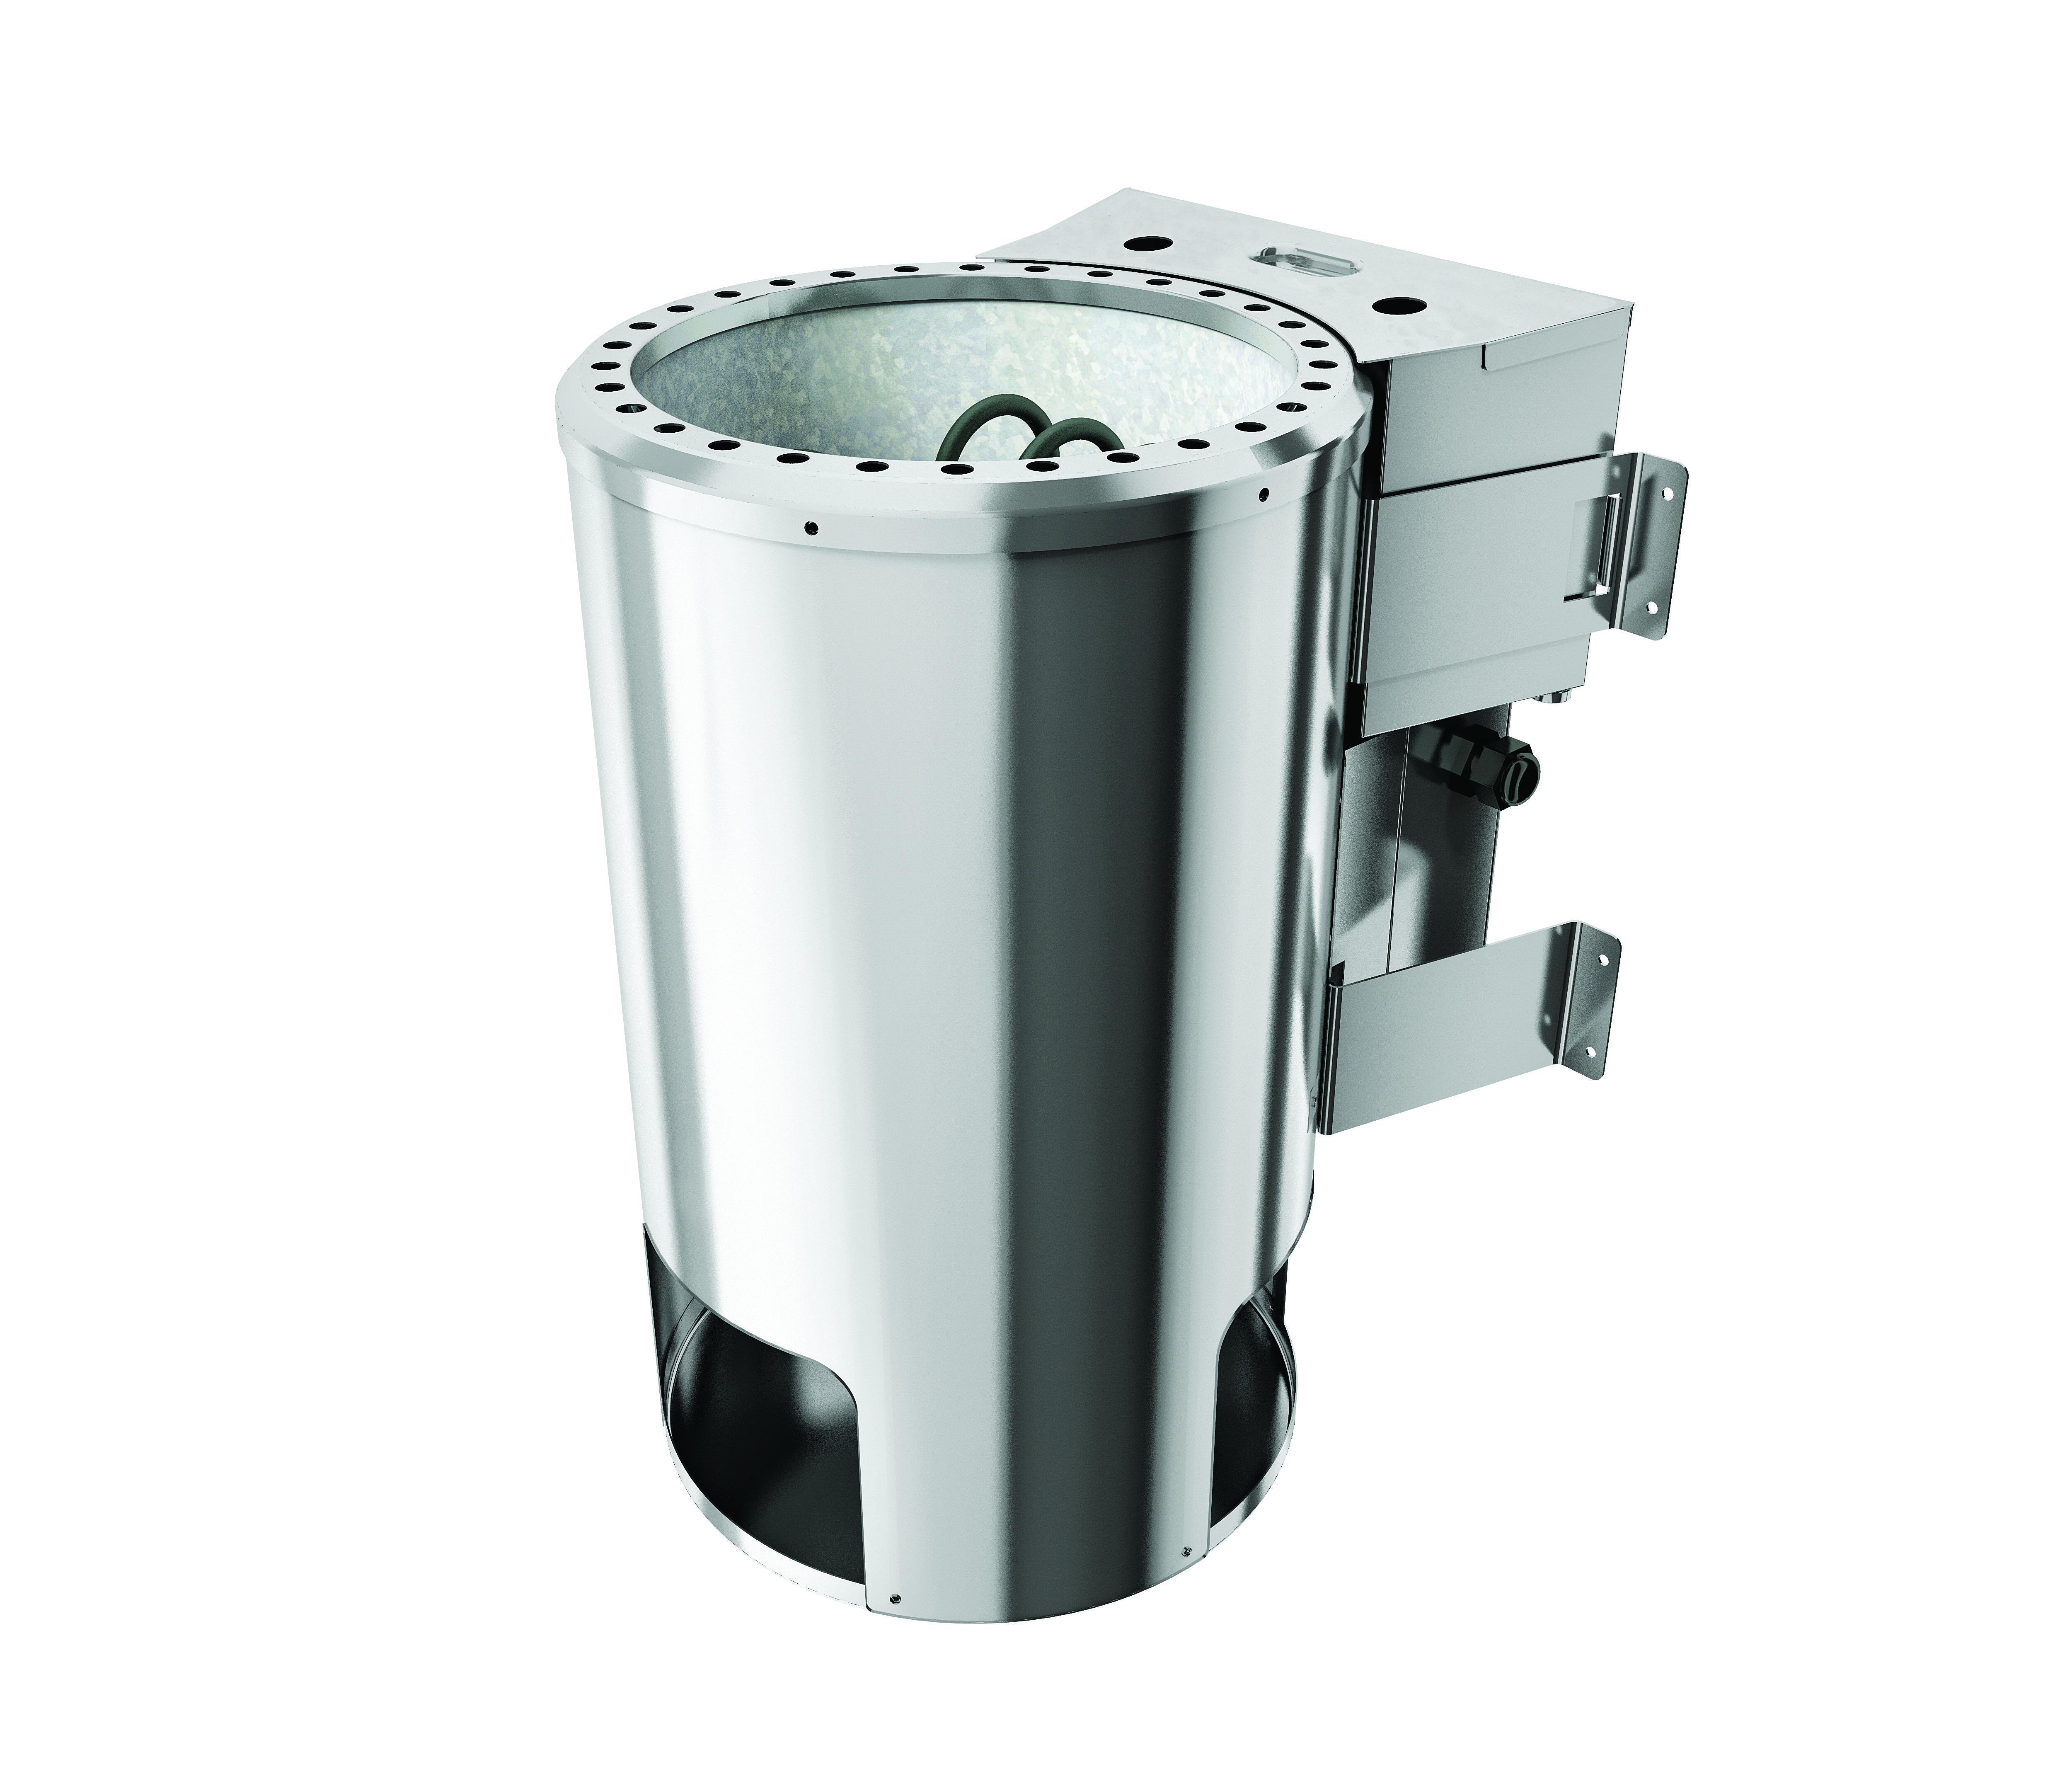 Woodfeeling Sauna Jella 38mm Dachkranz 230V Bio Saunaofen 3,6 kW exter Bild 4